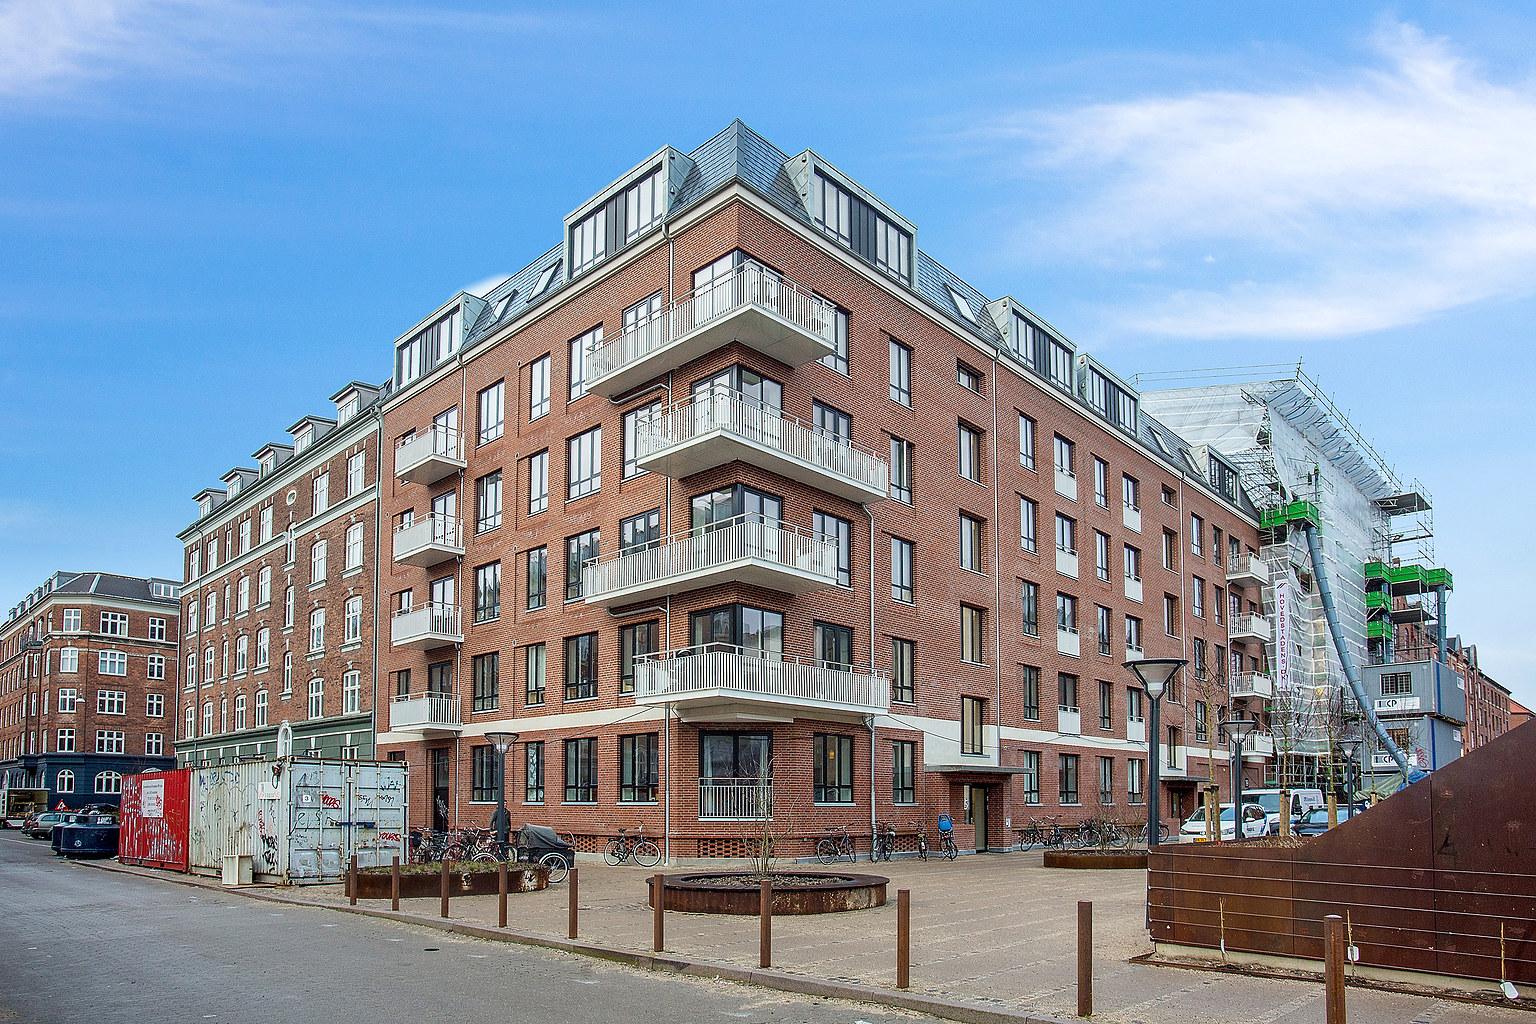 _Søllerødgade facade